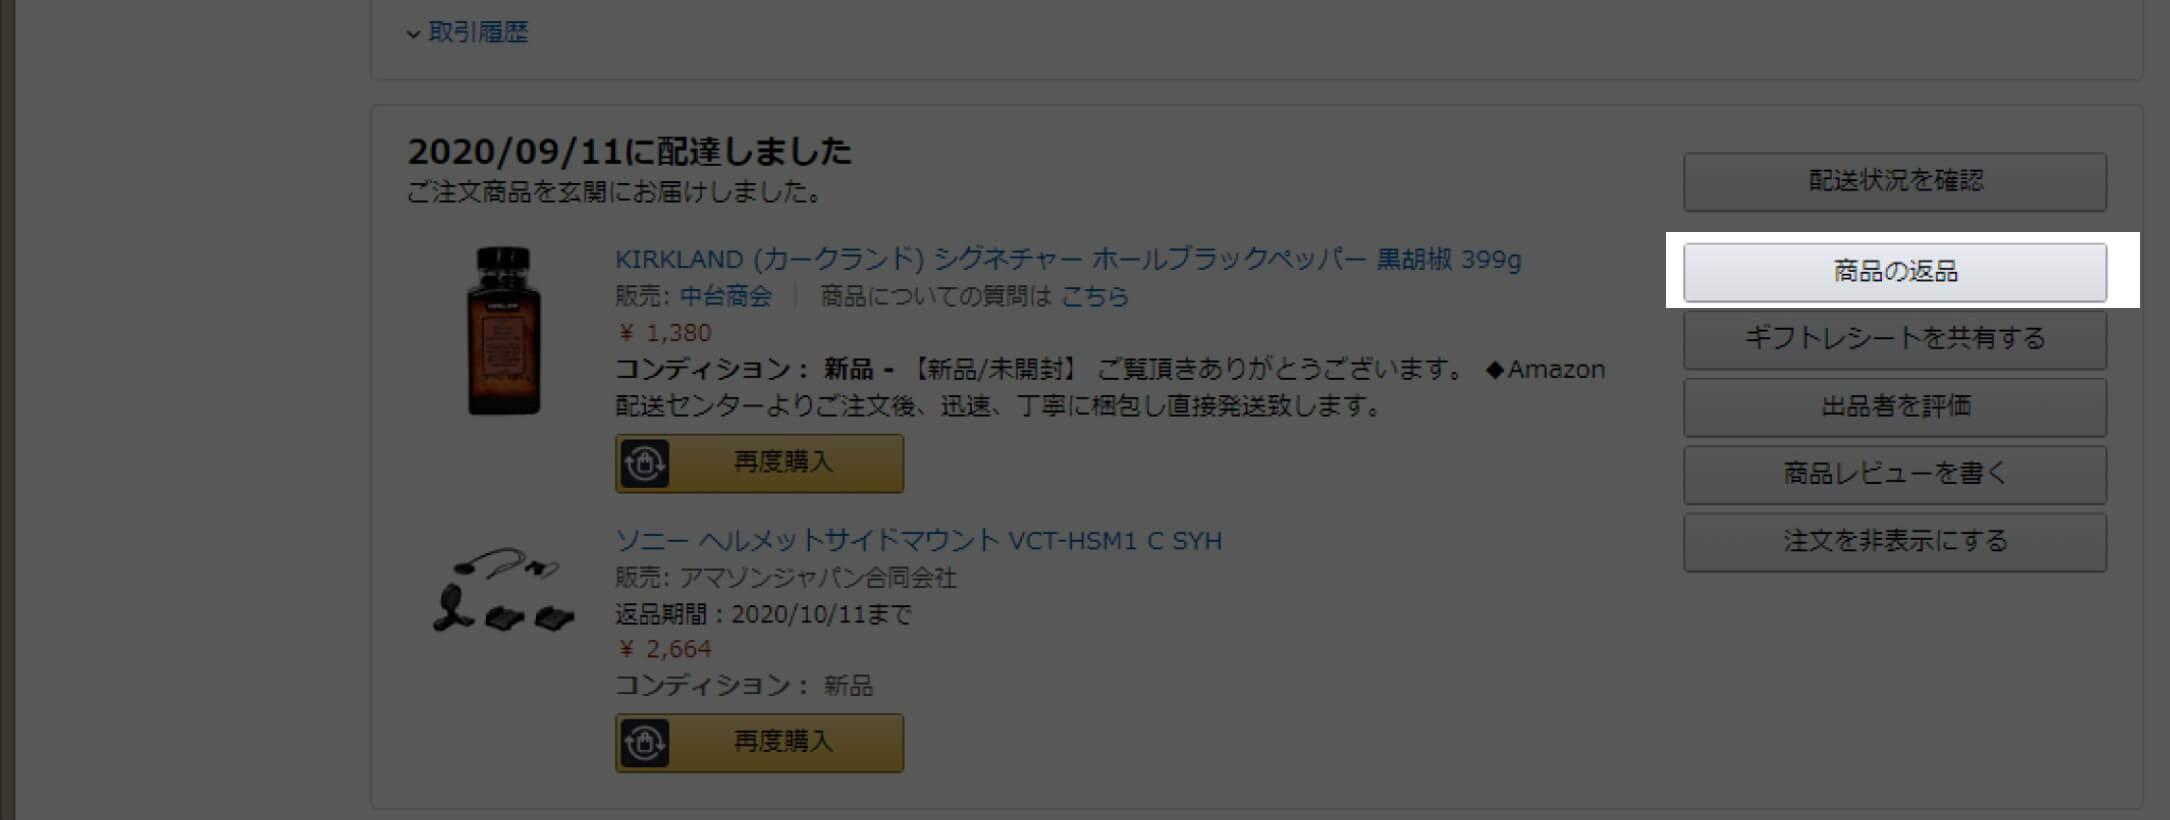 Amazon注文の詳細